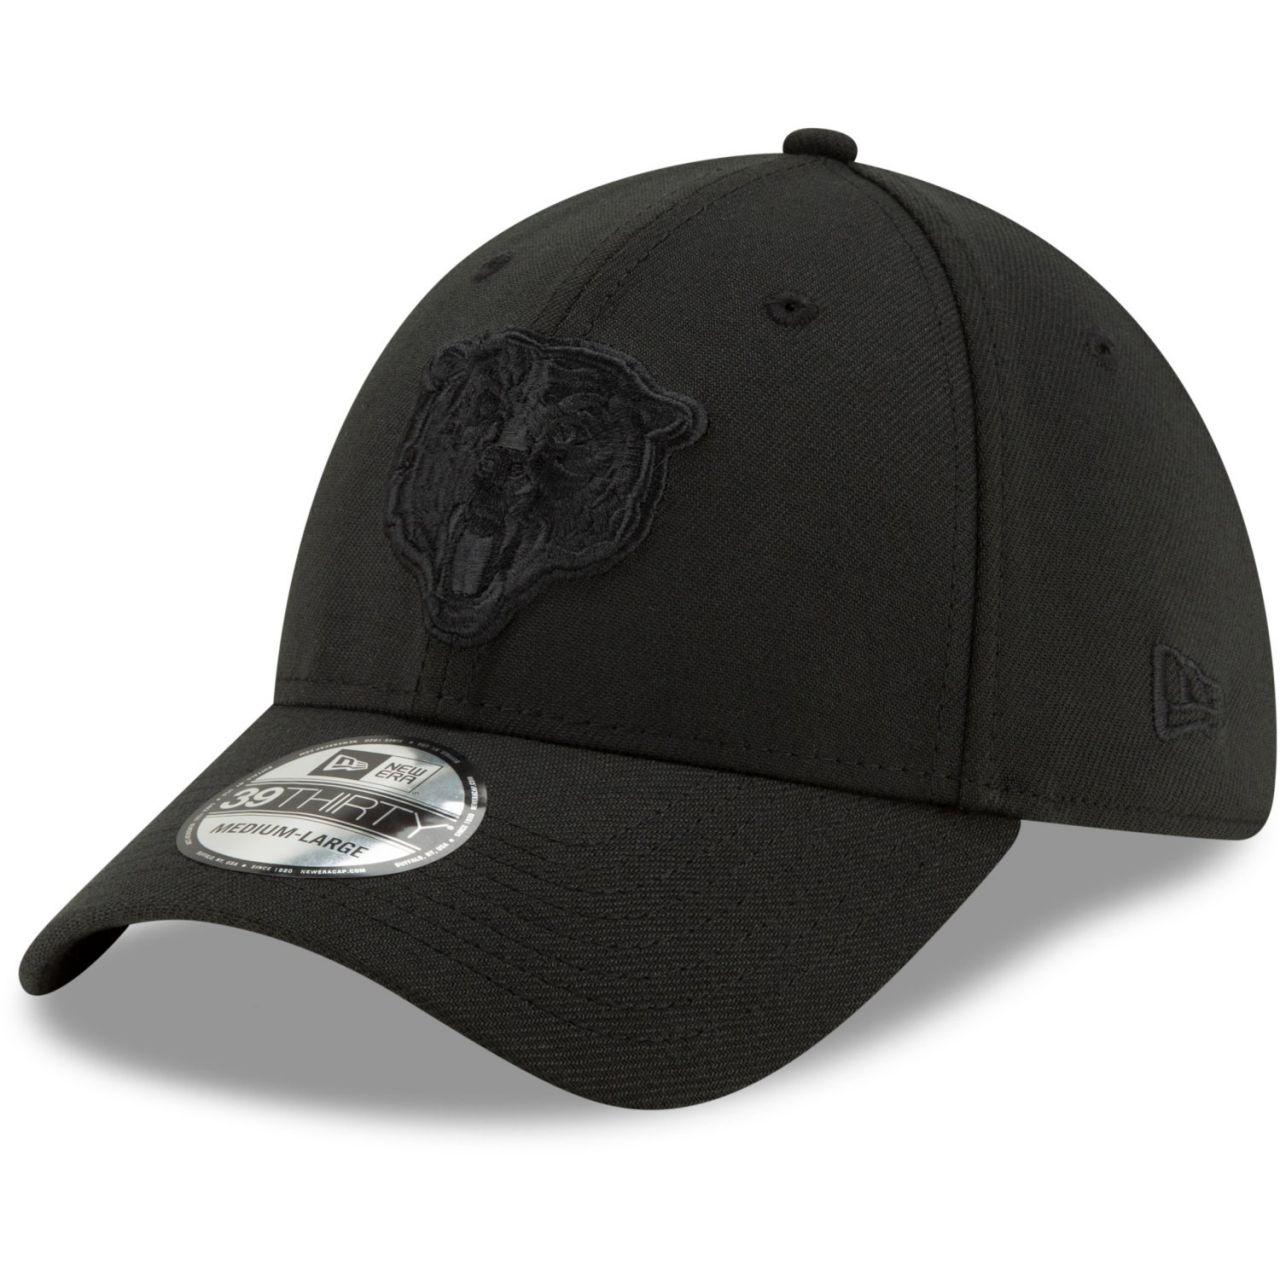 amfoo - New Era 39Thirty Stretch Cap - NFL Chicago Bears